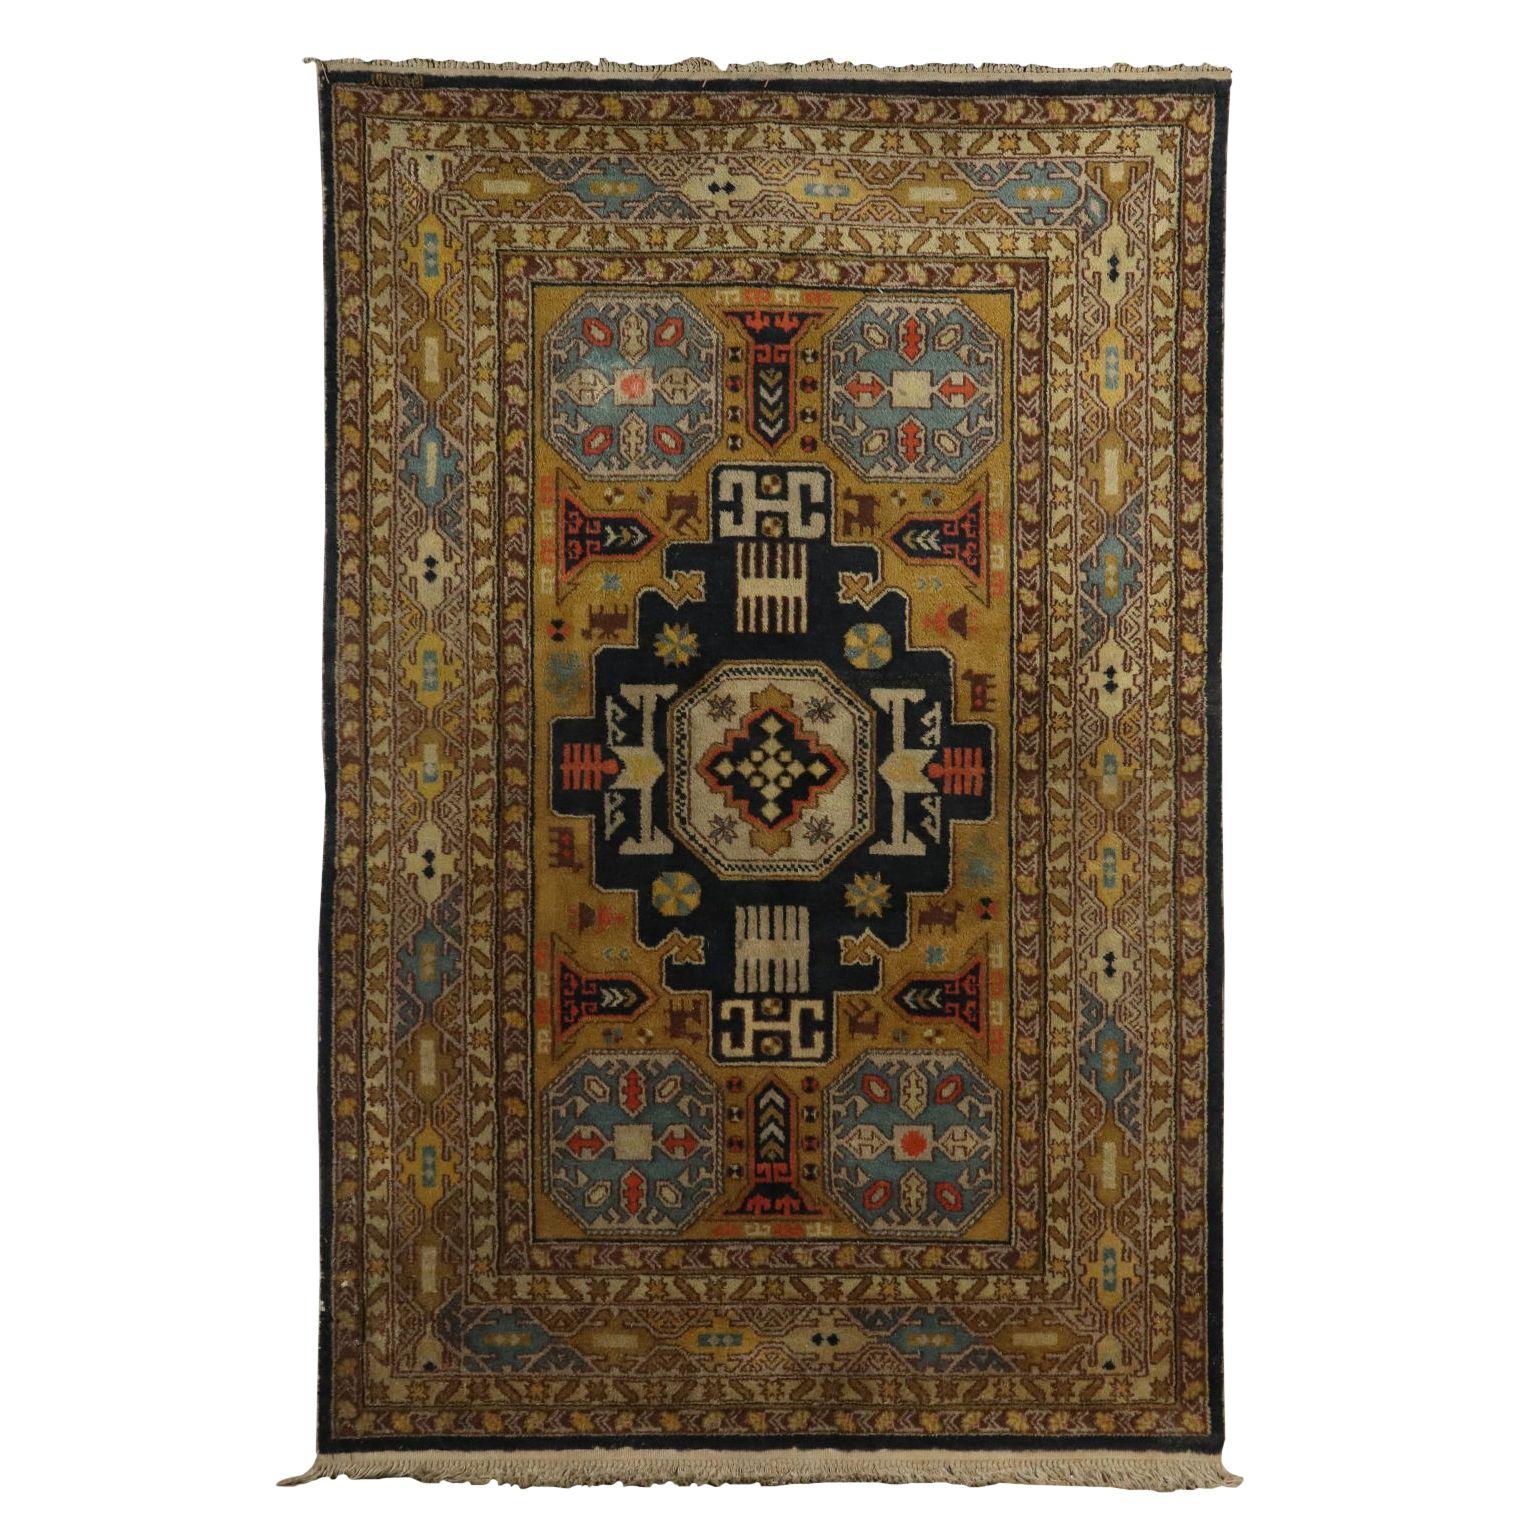 Antiquitaten Cotton And Wool Kuba Carpet Azerbaijan 1980s 1990s Cotton And Wool Kuba Carpet Azerbaijan 1980s 1990s Big Knot Ha Tapis Laine Tapis Moderne